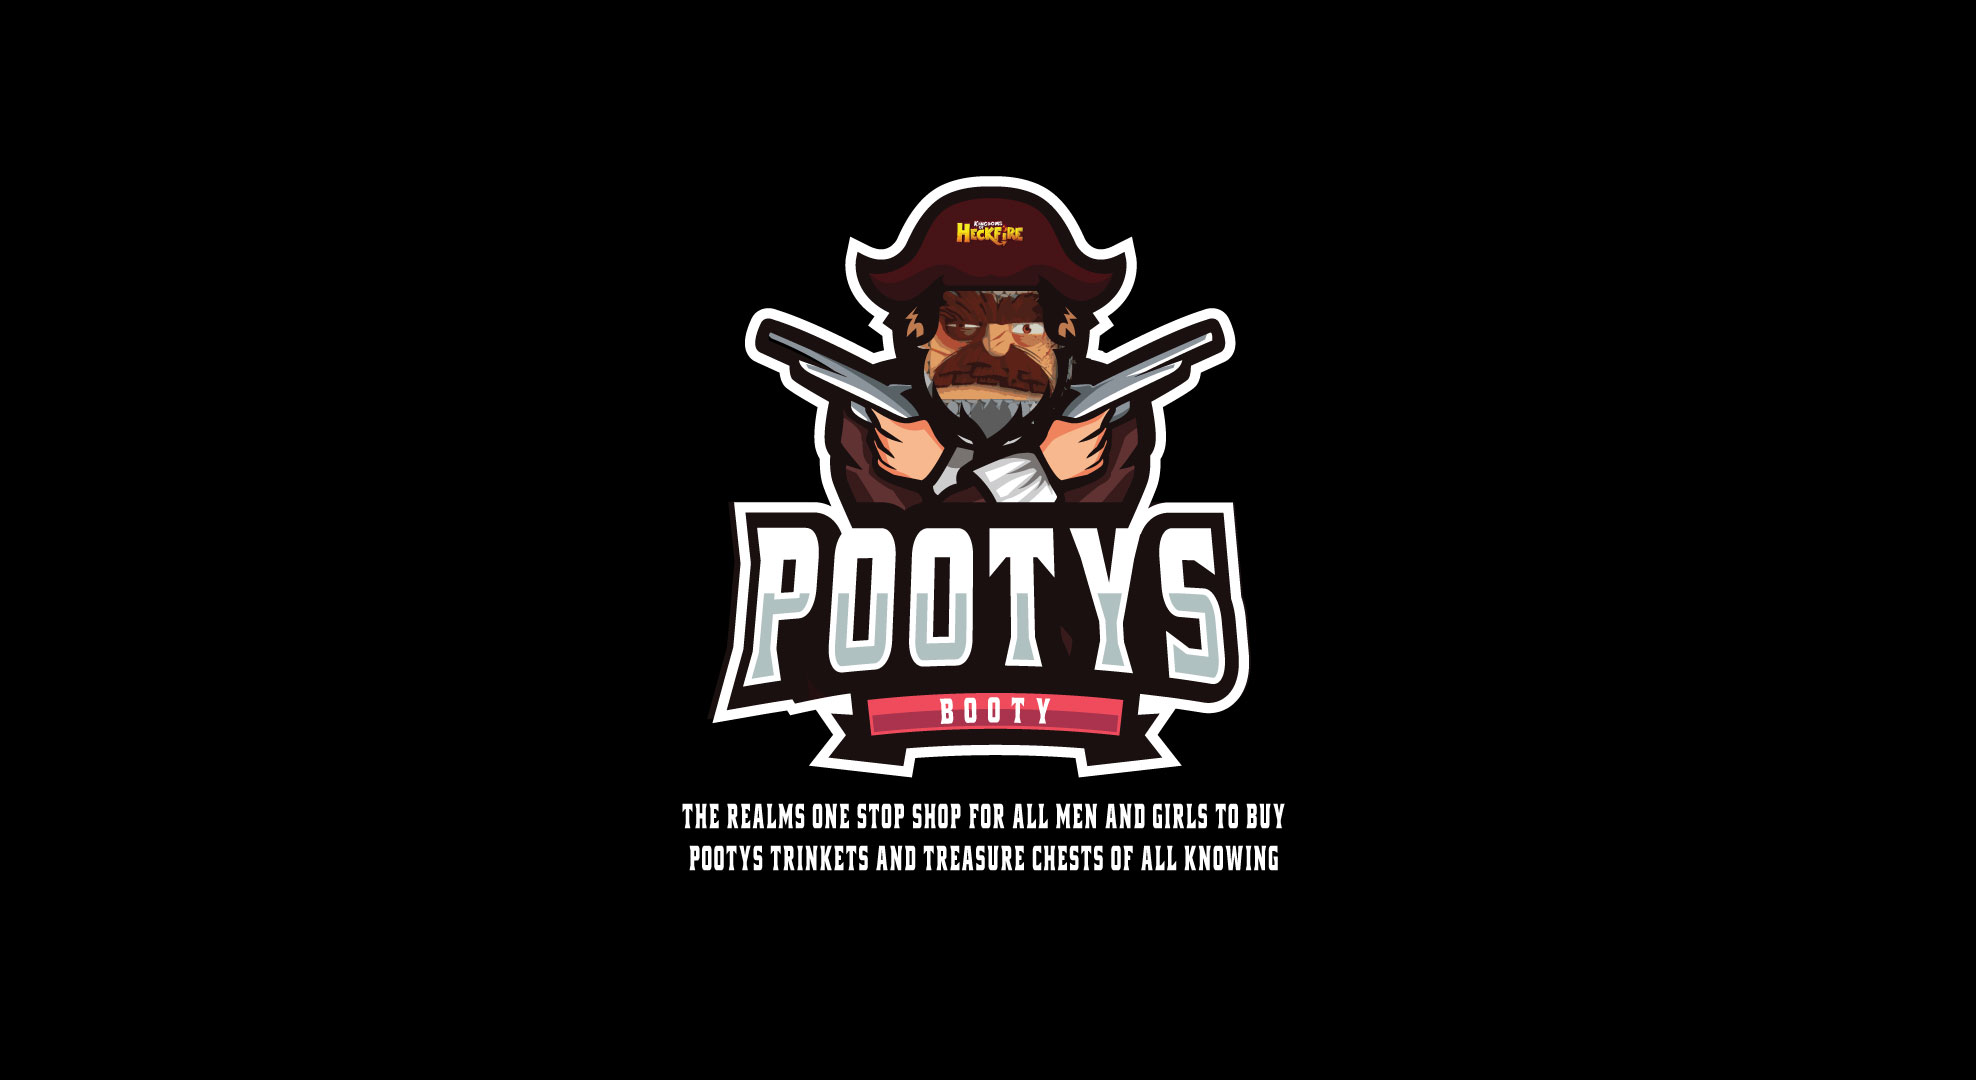 PootysBooty.com